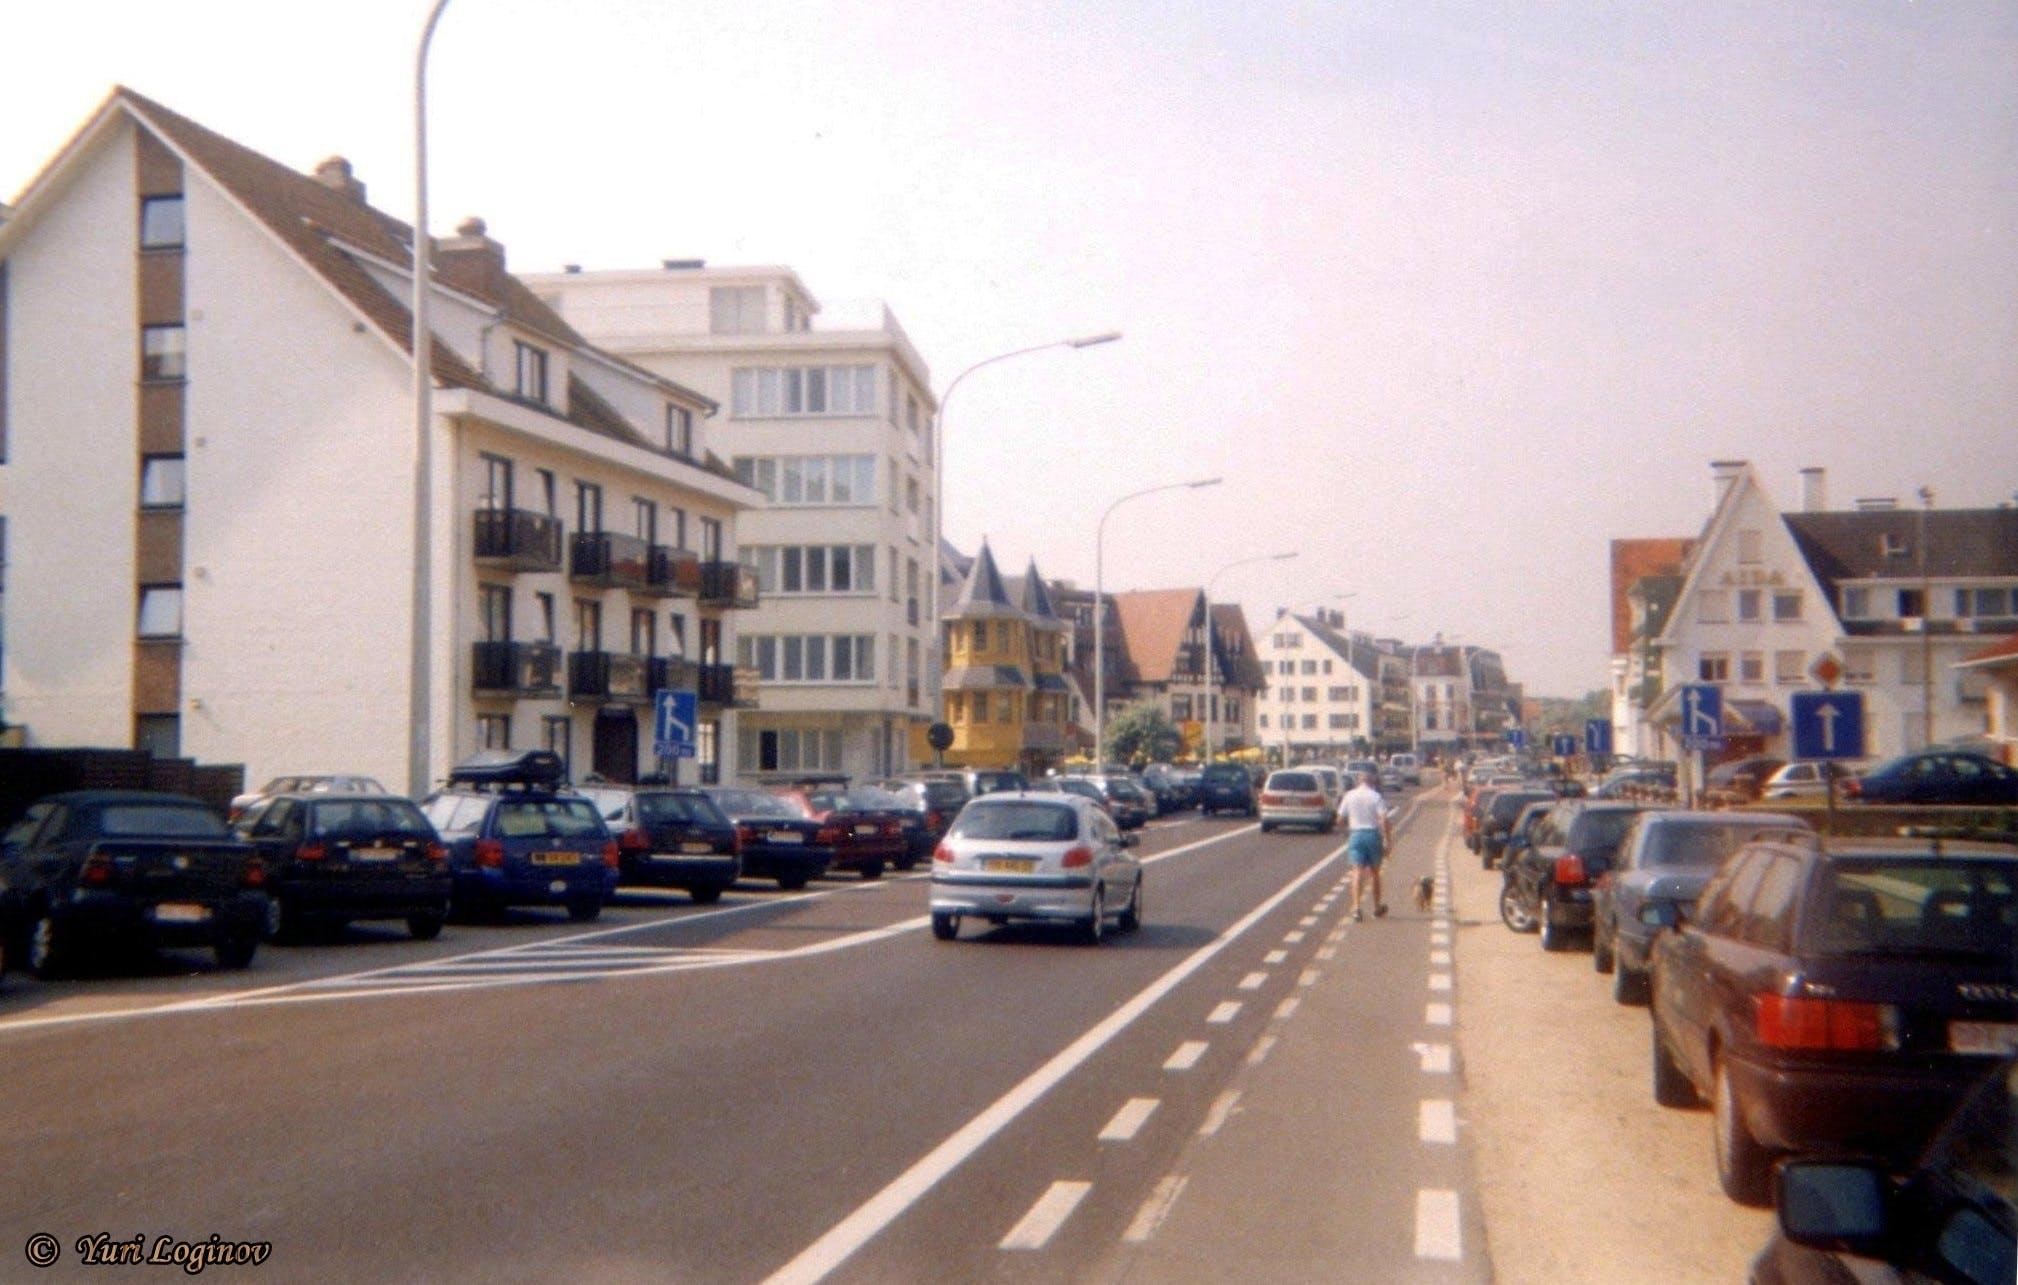 Free stock photo of Belgium, België, Bredene